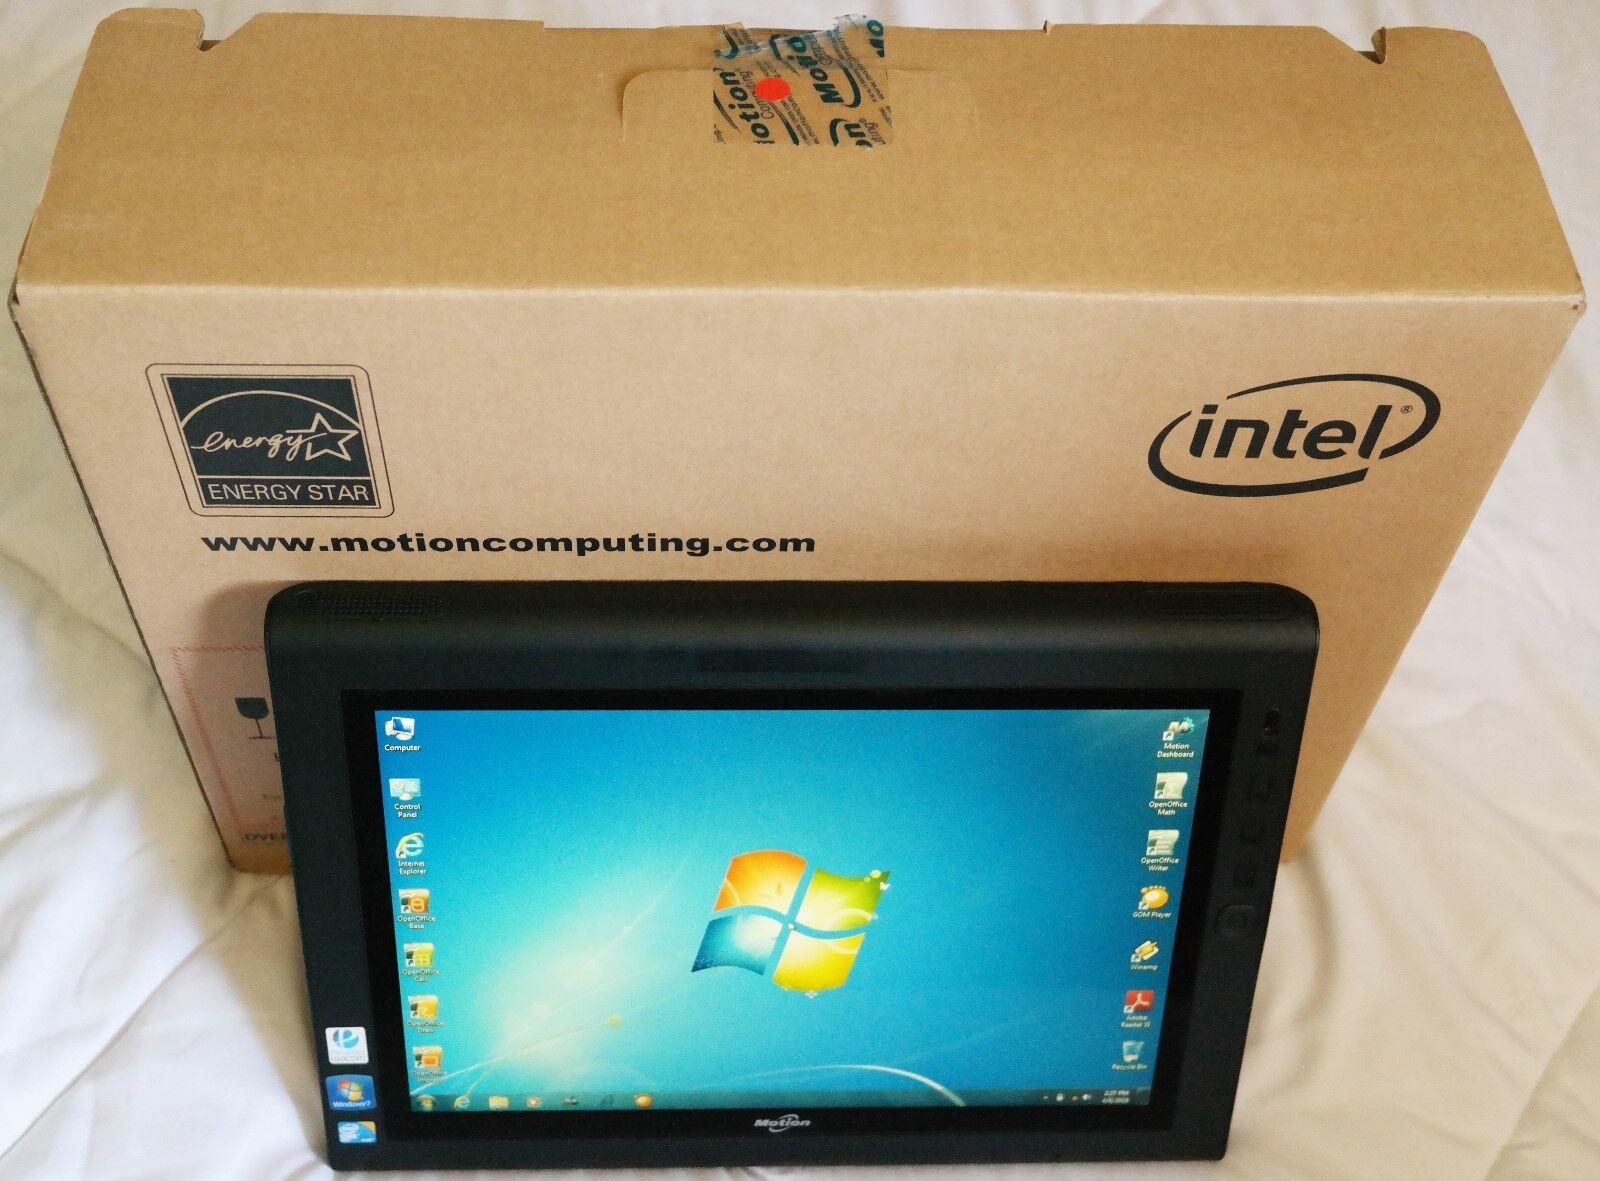 Motion Computing J3500 Core i7 1.47GHz-(2.53G) 8GB 256GB SSD View Anywhere Gobi